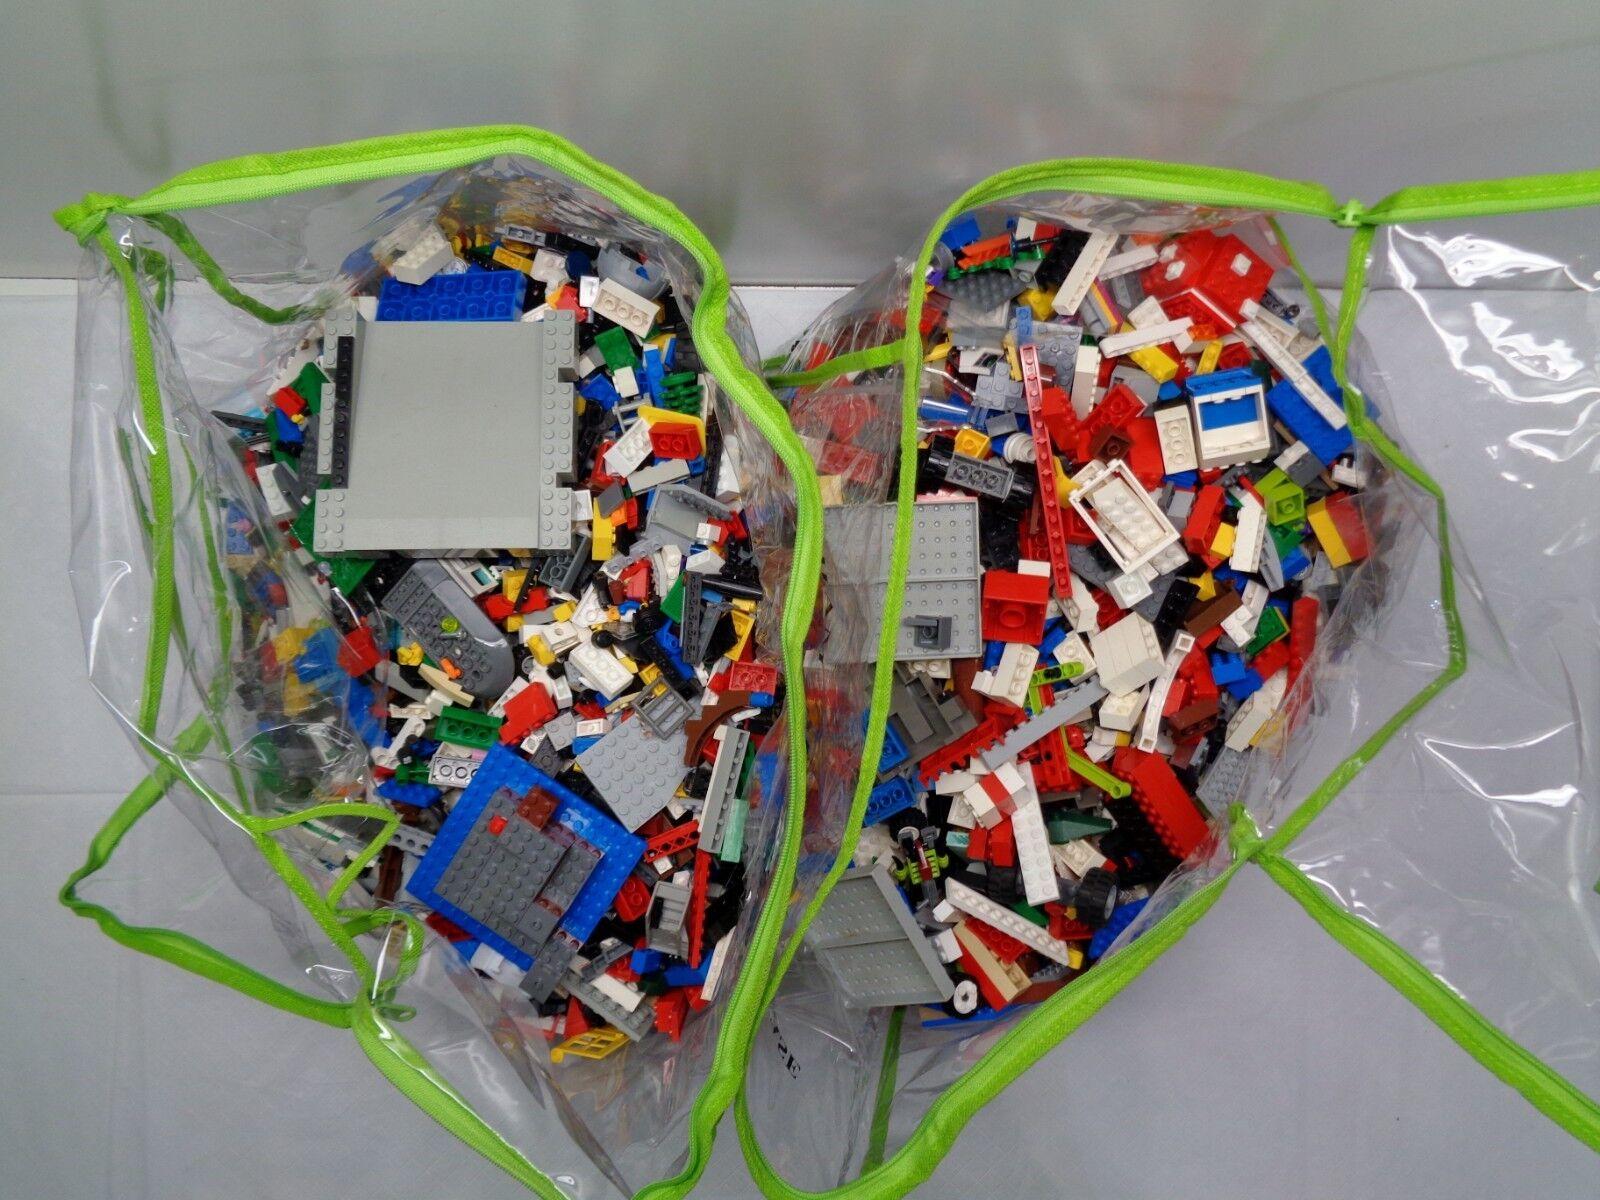 Lego Huge Lot 28 Pounds lbs Assortment Bulk Legos Ship Car  Baseplate Premium